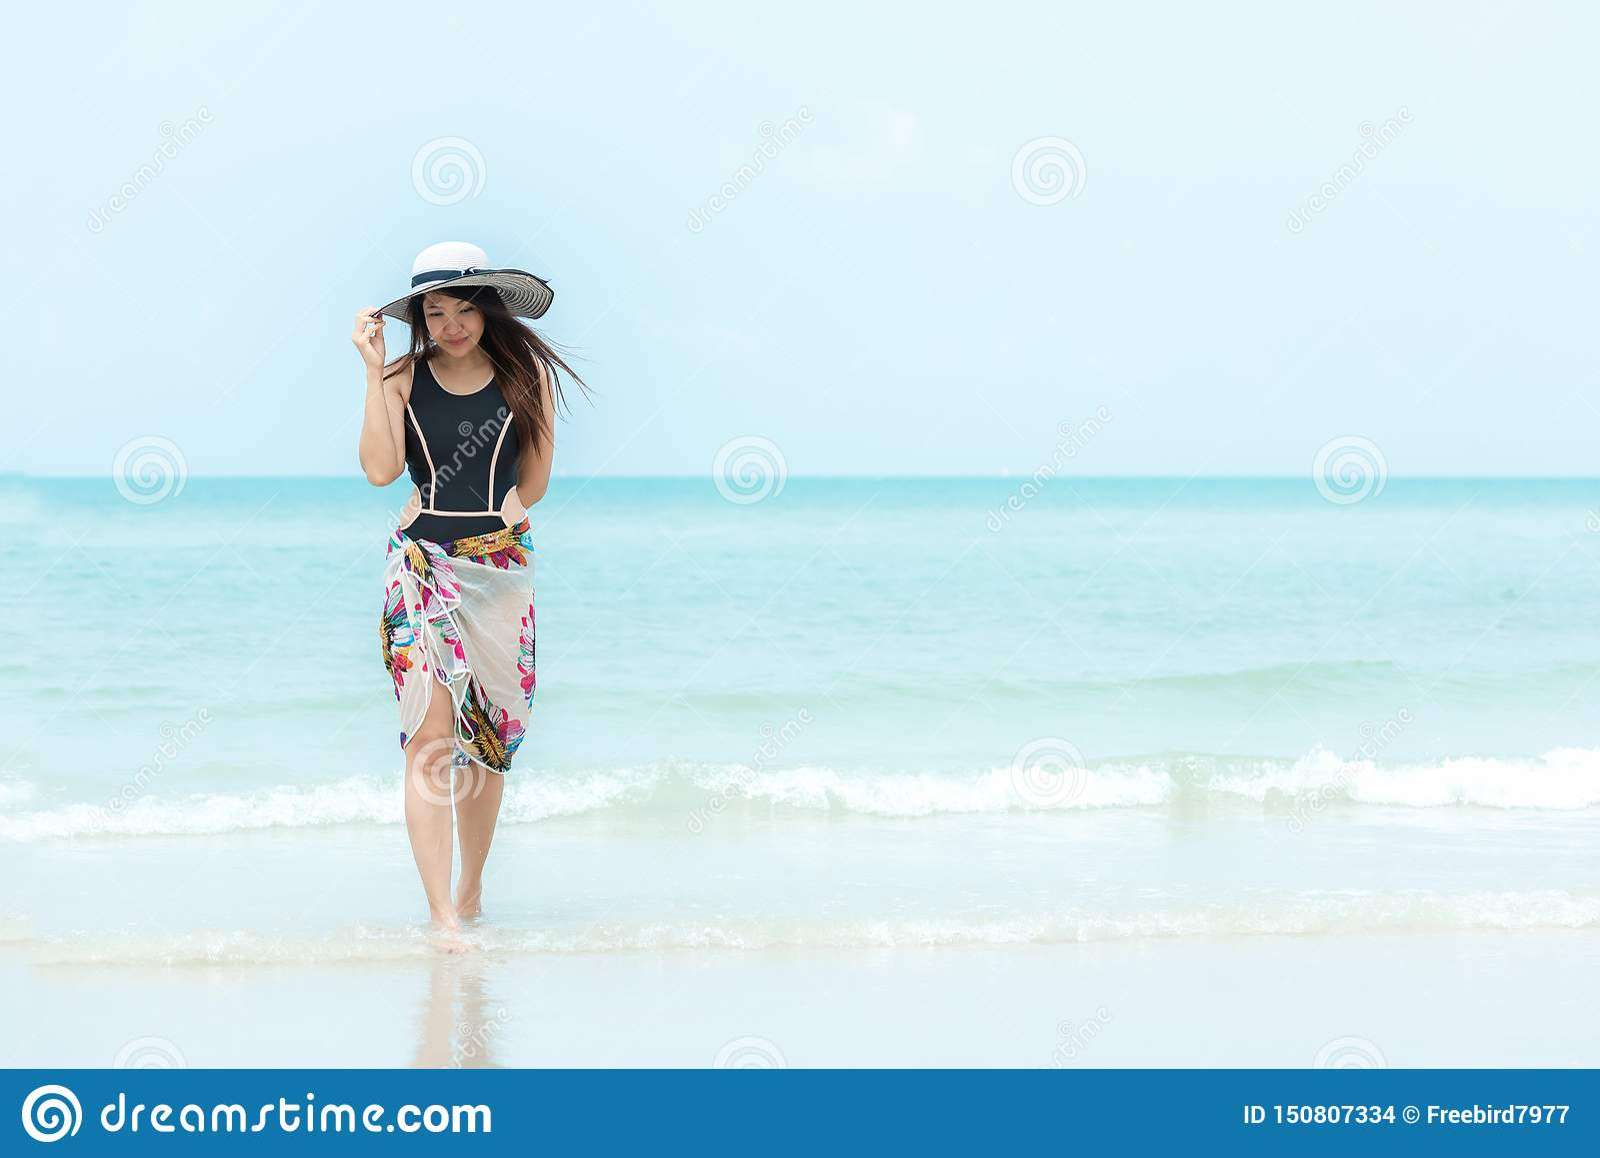 R Ψύχρα γυναικών τρόπου ζωής που κρατά το μεγάλο άσπρο καπέλο και που φορά τα θερινά ταξίδια μόδας μπικινιών που περπατούν στο αμ